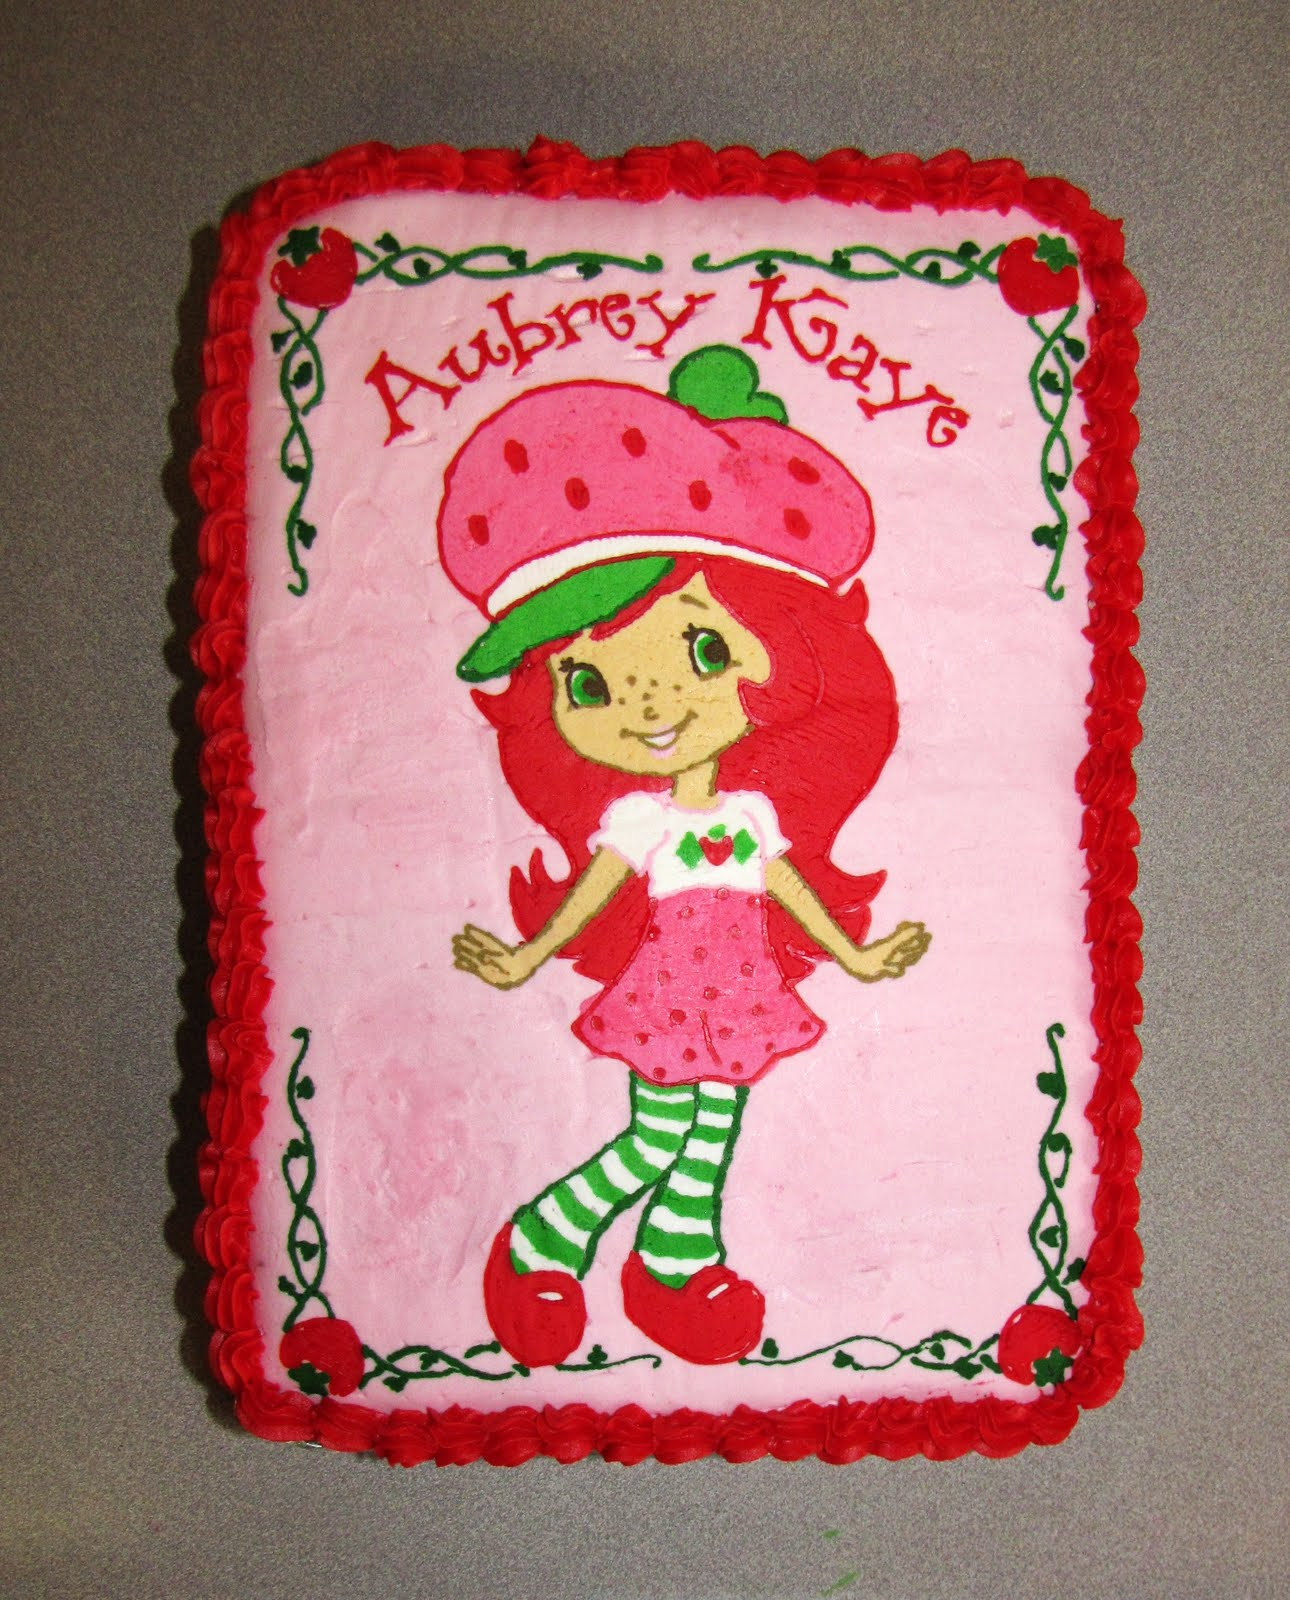 The Buell Family Strawberry Shortcake Birthday Party